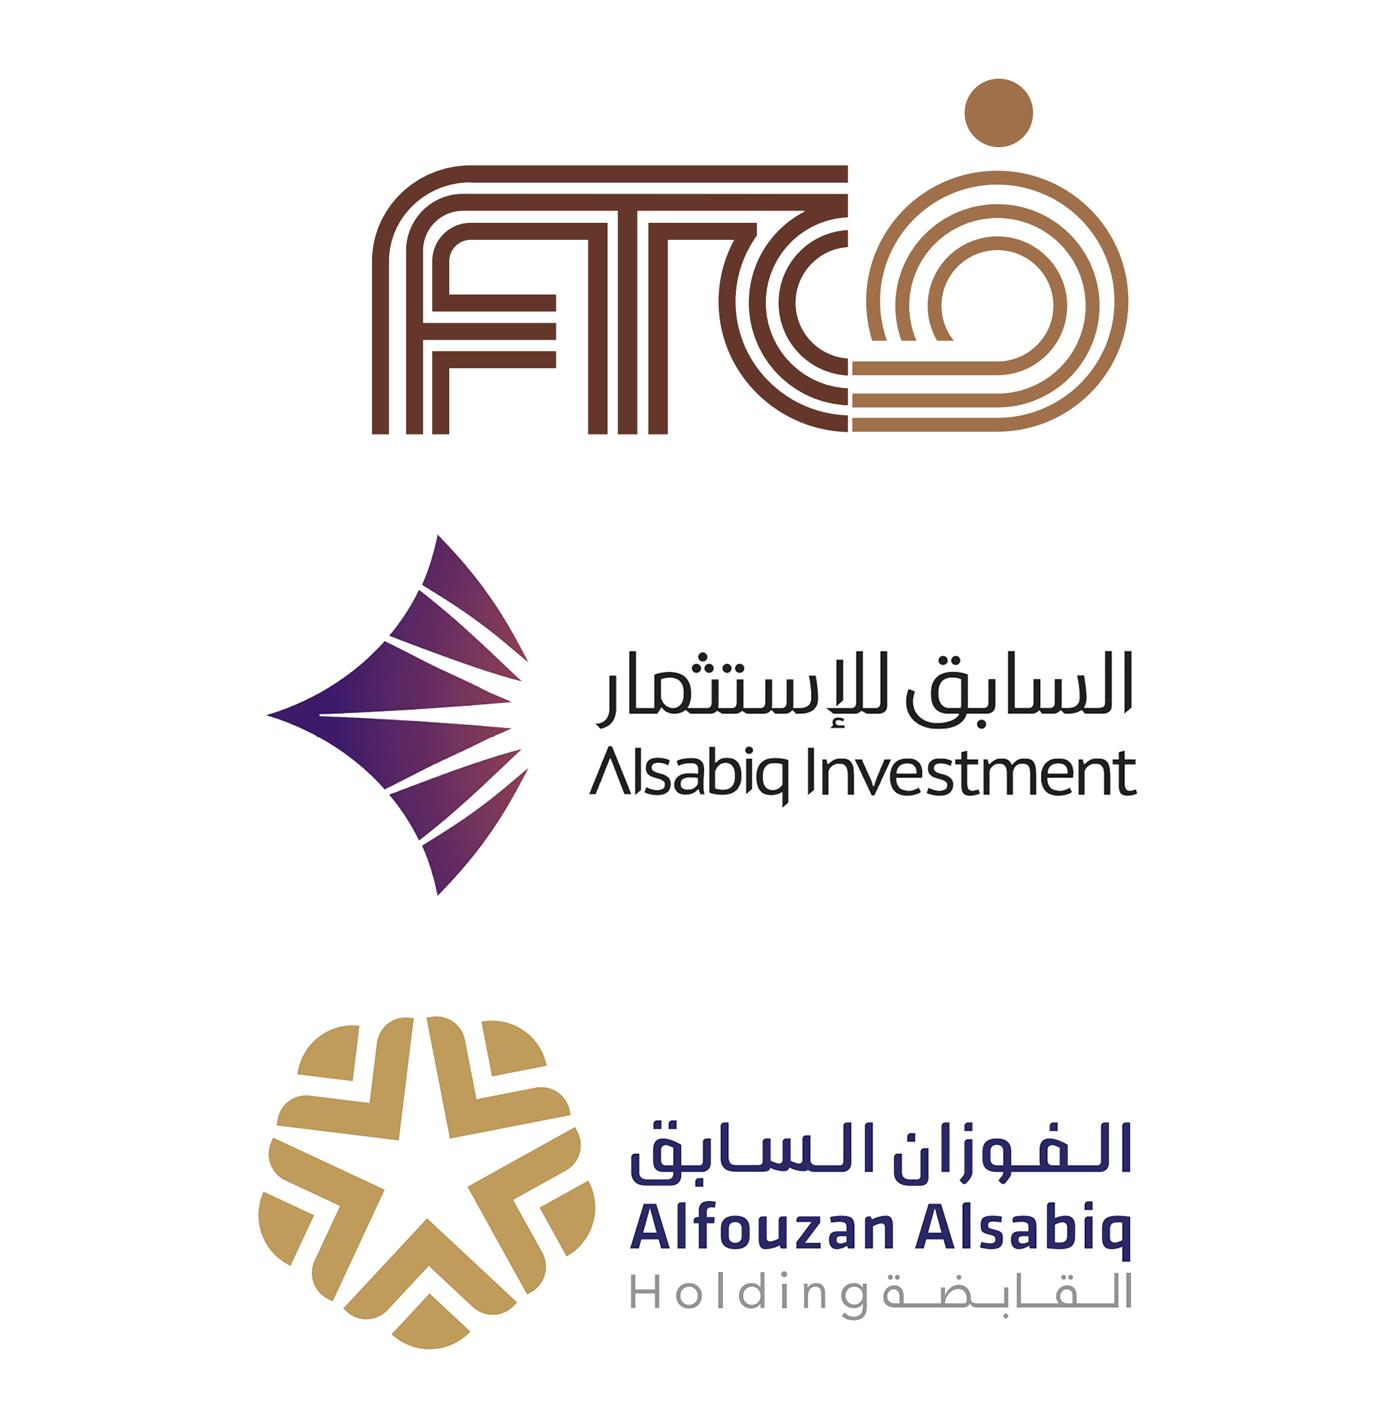 Al Fouzan Group (GHC) Logo